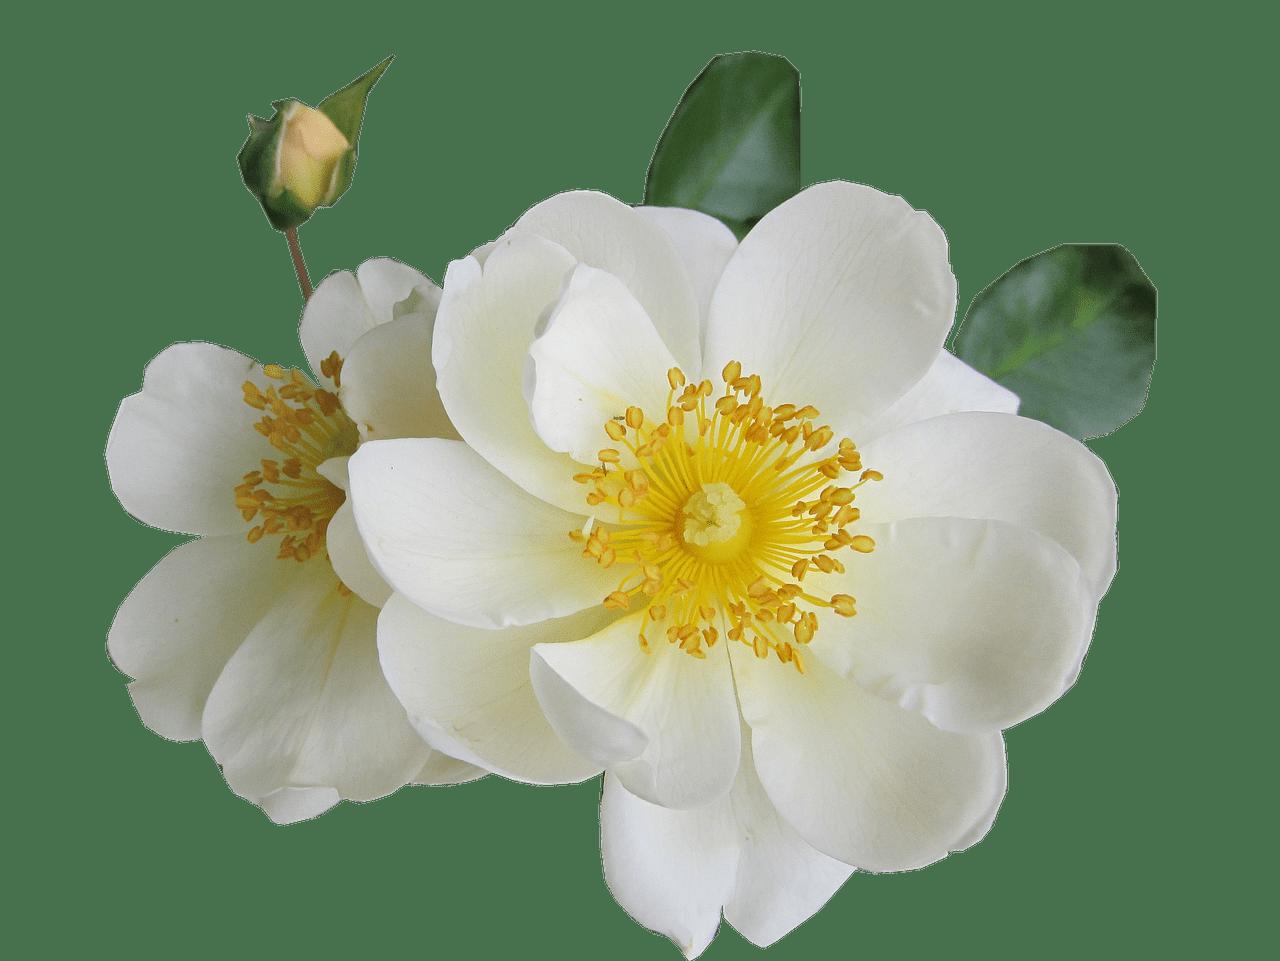 rose - Sonstige Anlässe